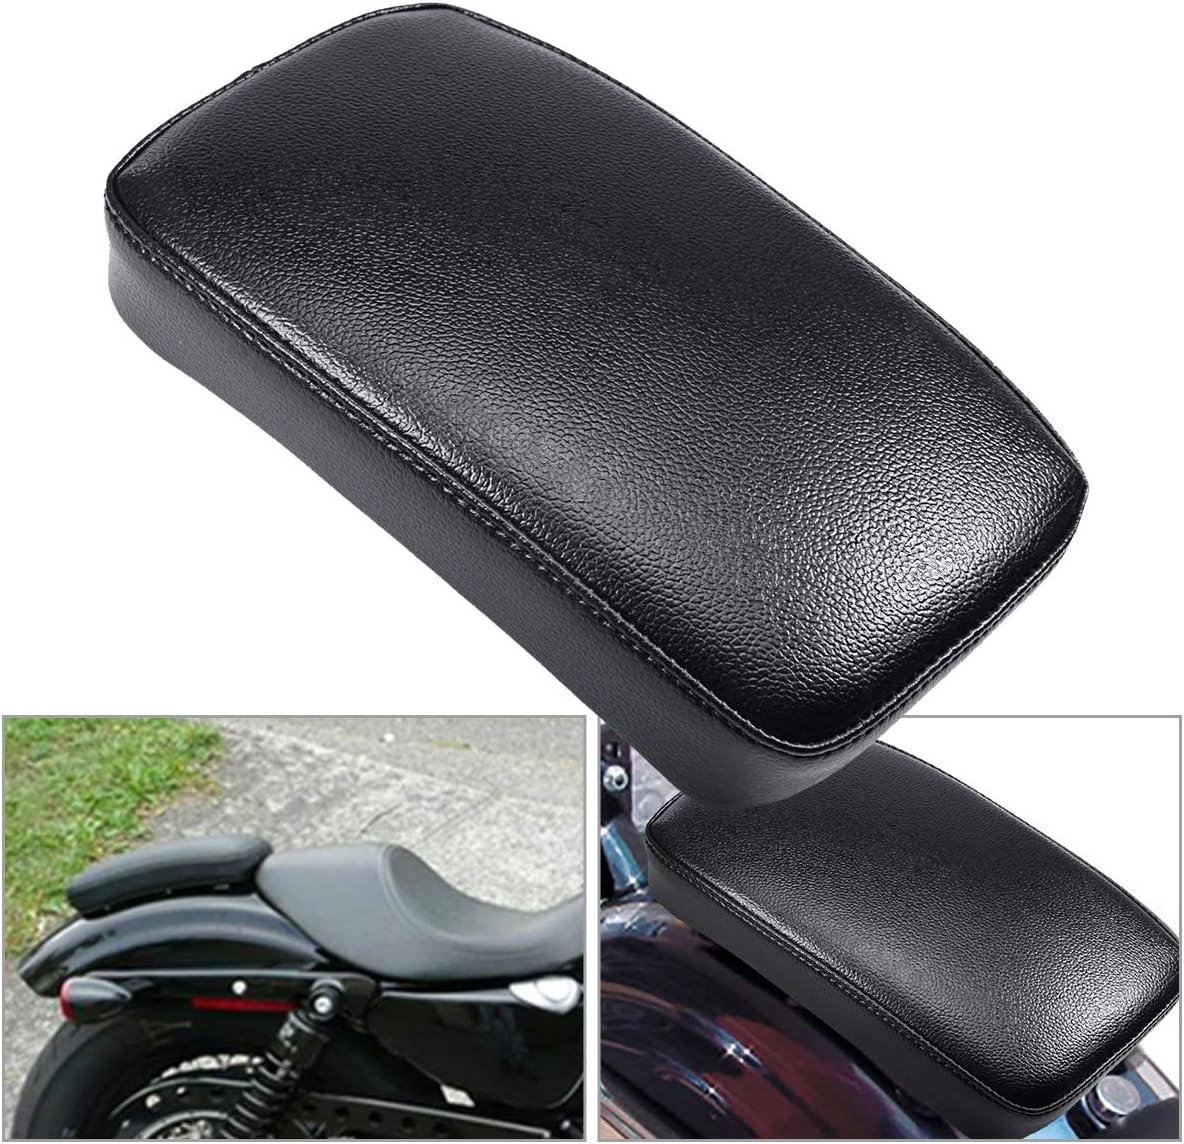 35% OFF INNOGLOW Motorcycle Seat Rectangular Passenger Pad 6 OFFicial shop Suctio